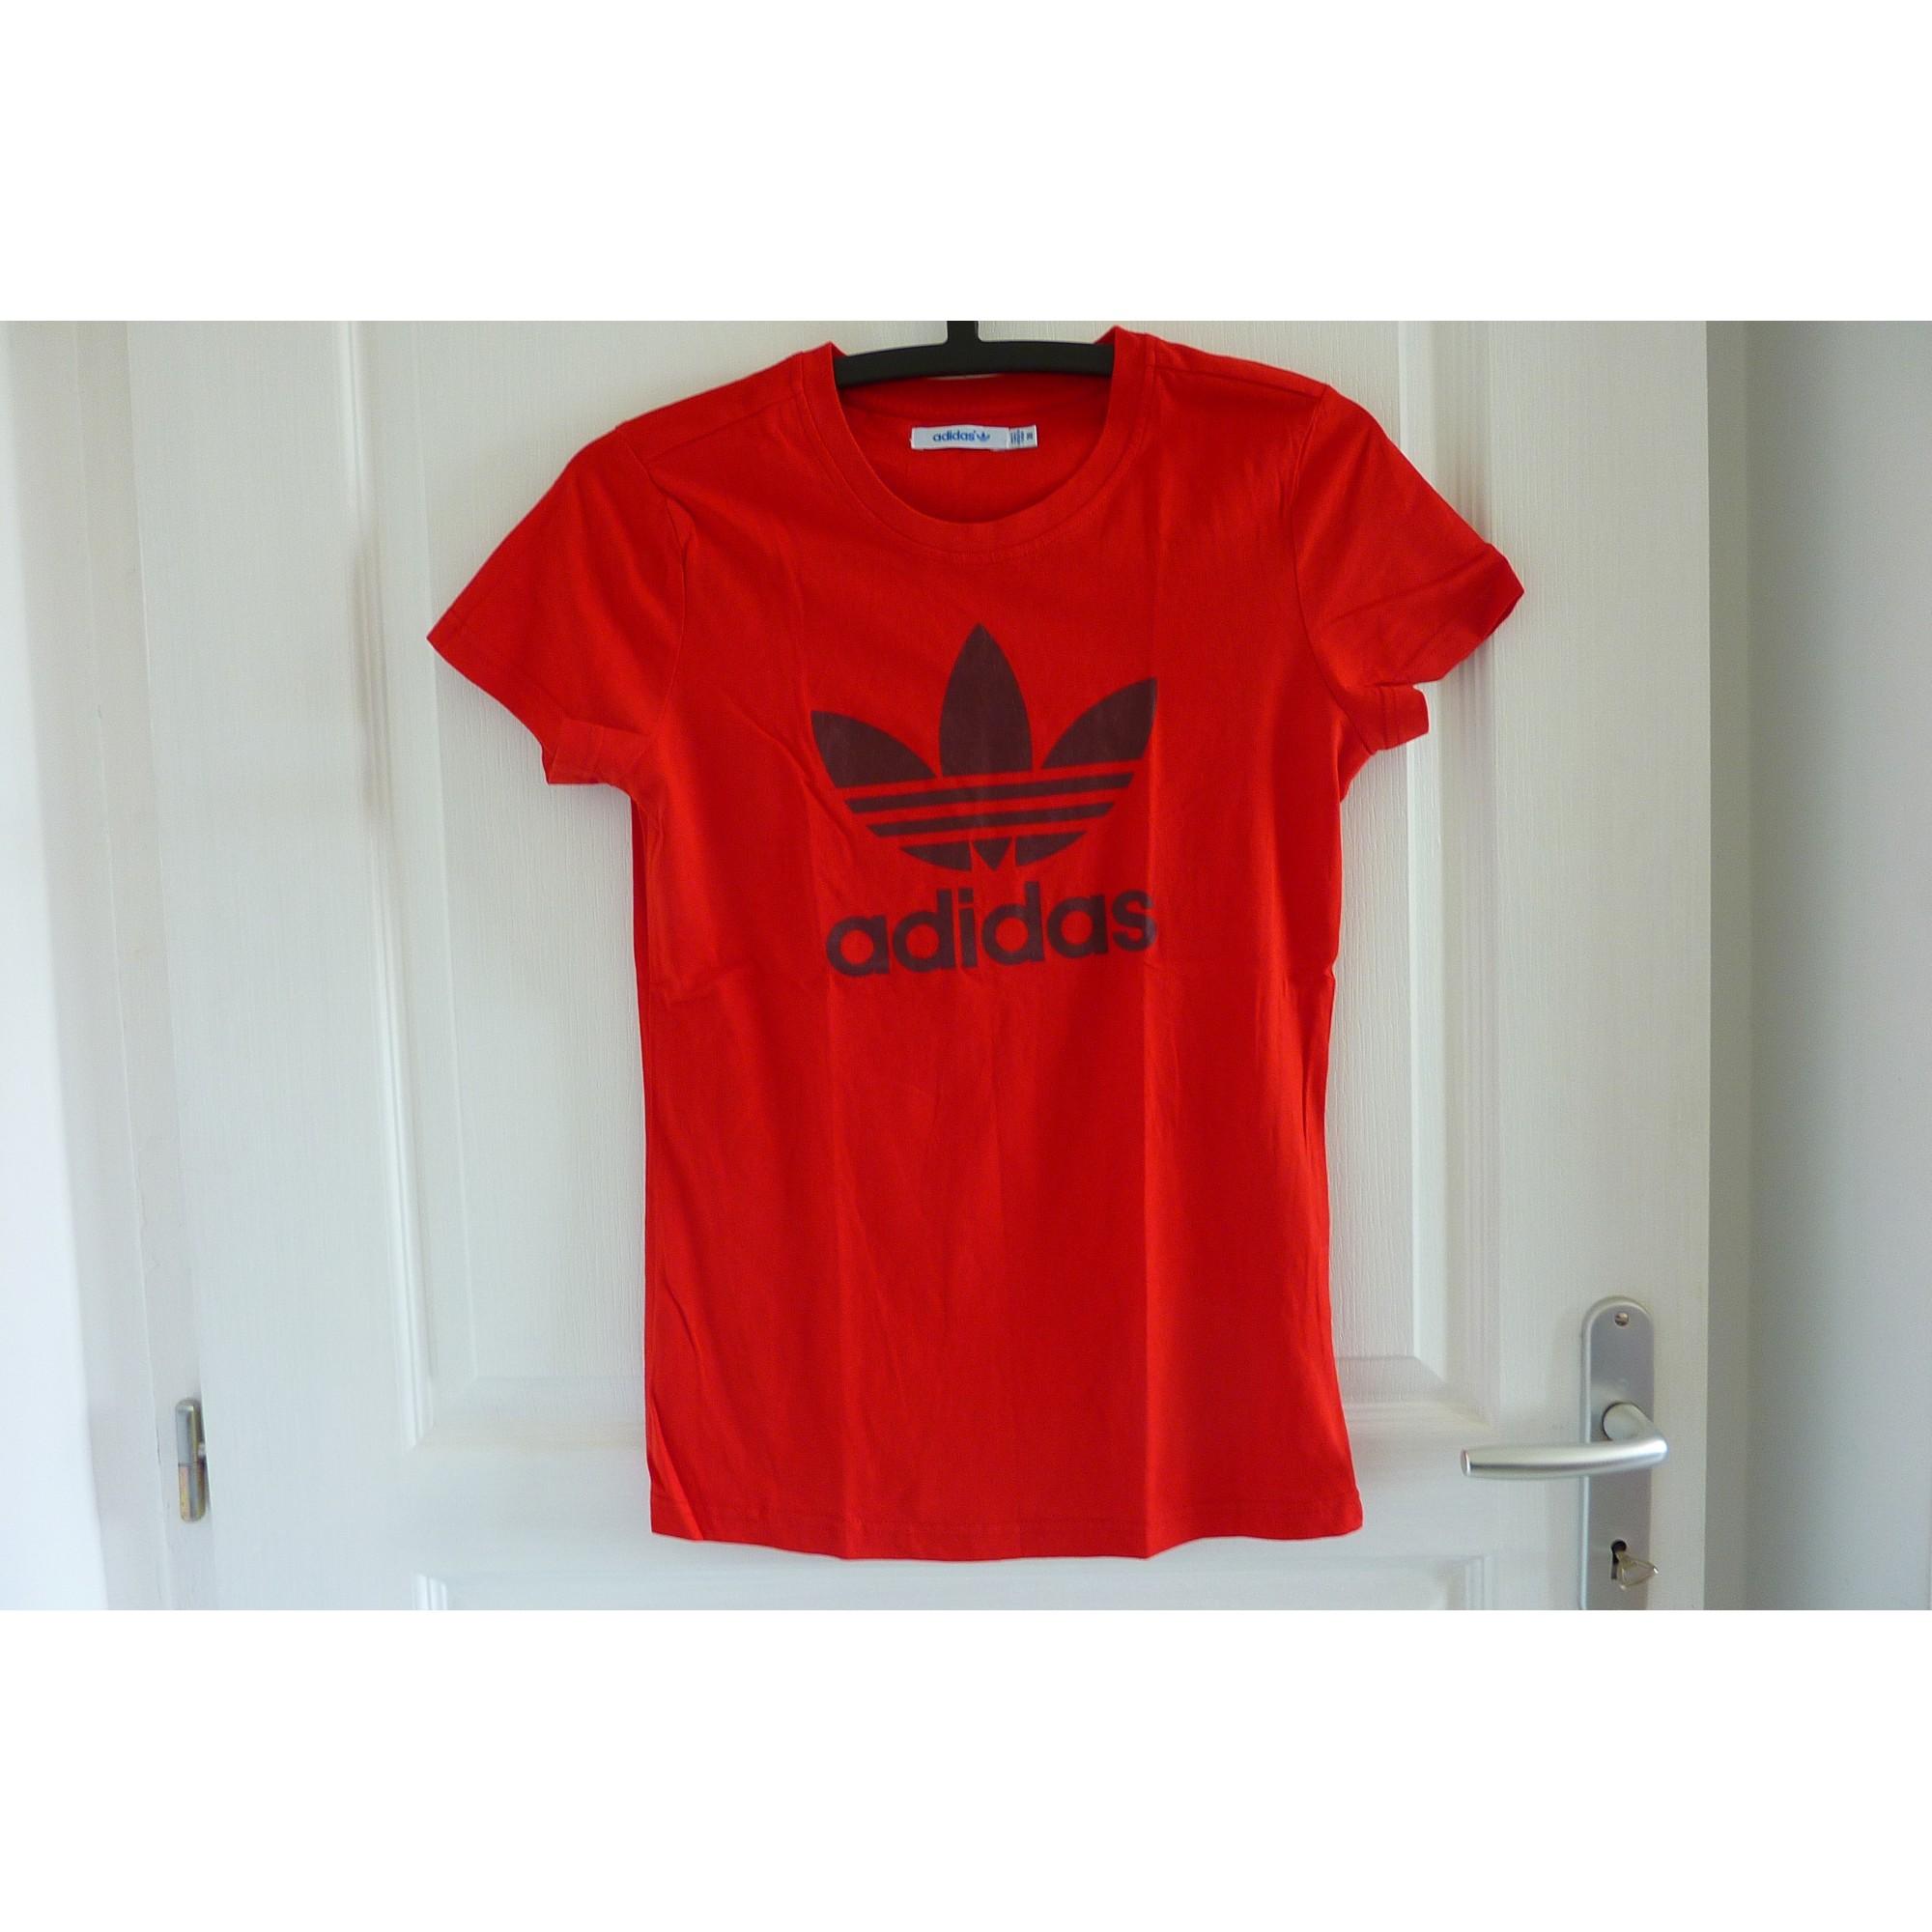 56f2ef7bf52ed Top, tee-shirt ADIDAS 36 (S, T1) rouge - 6393391